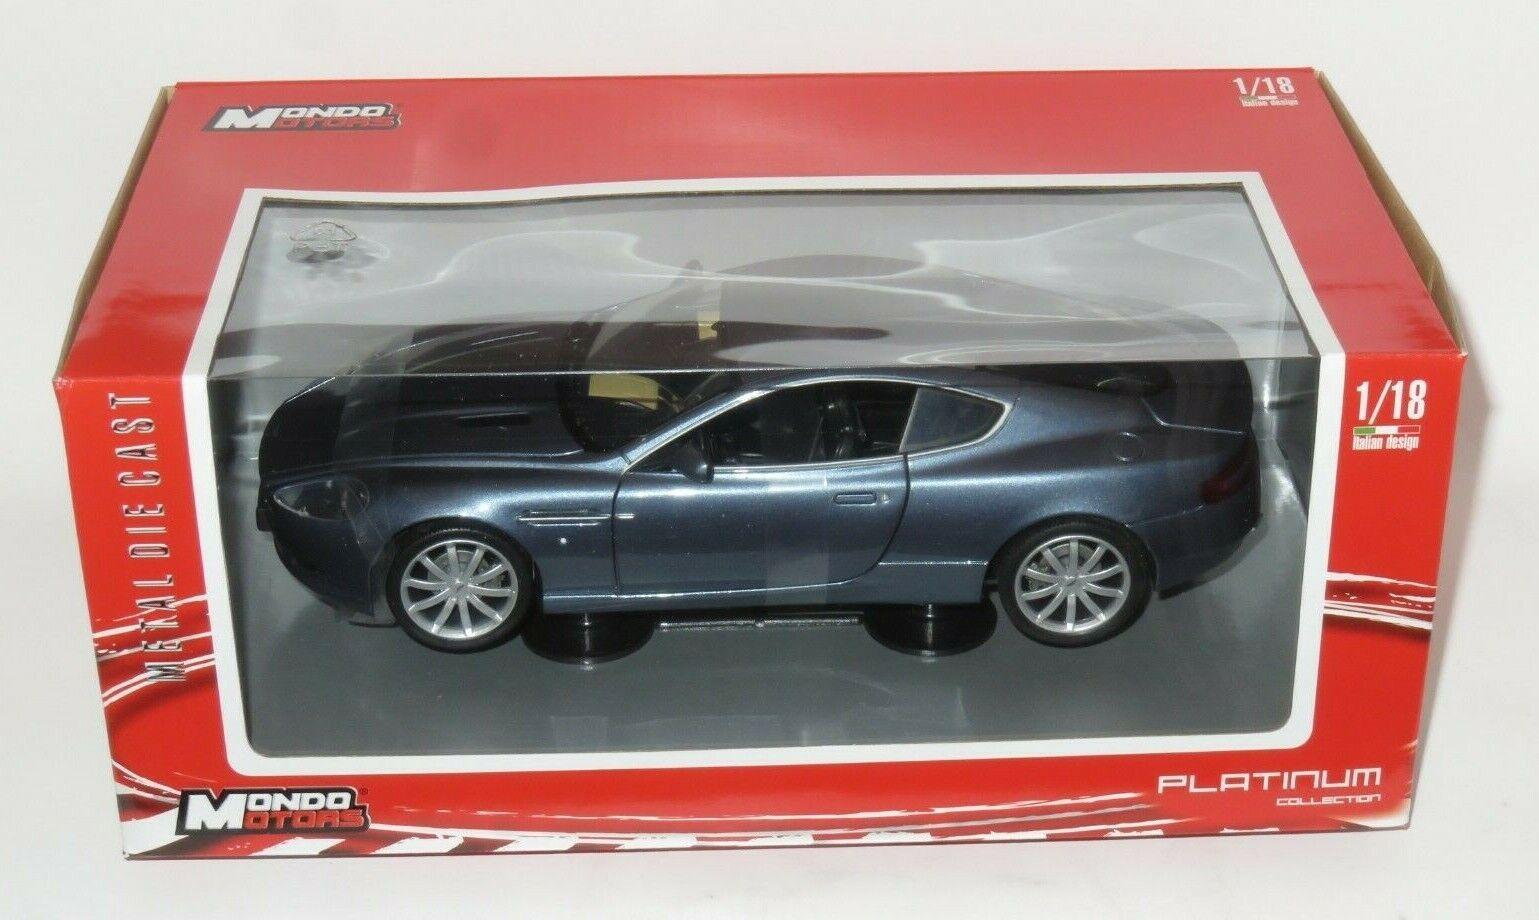 1 18 Mondo Motors   -  Aston Martin DB9 Coupe  -  Metallic bluee Grey